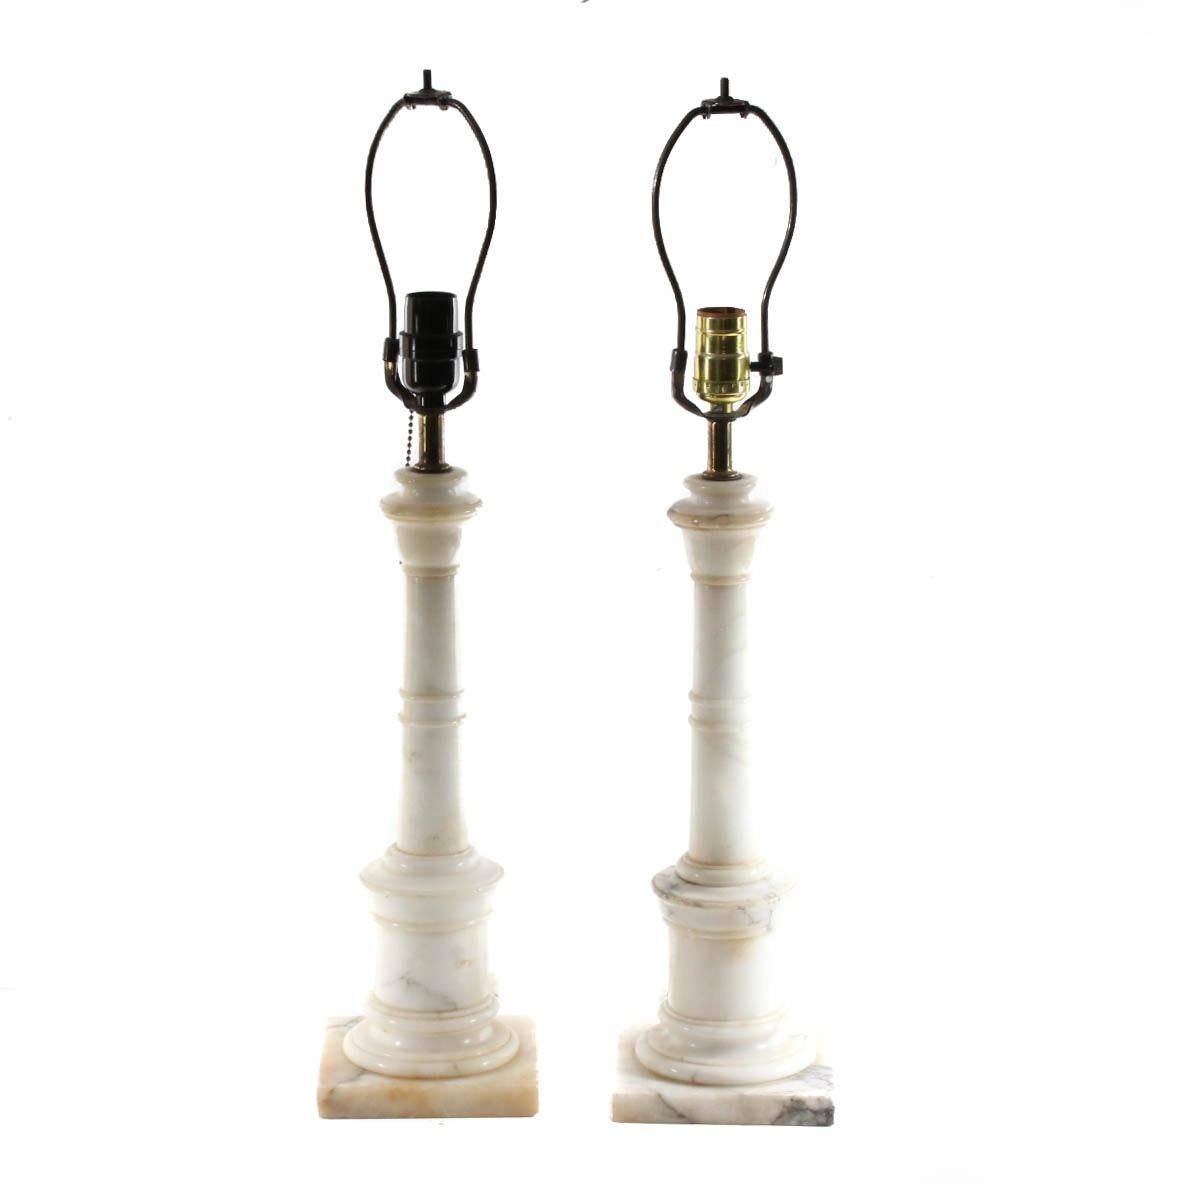 Carrara Marble Table Lamps